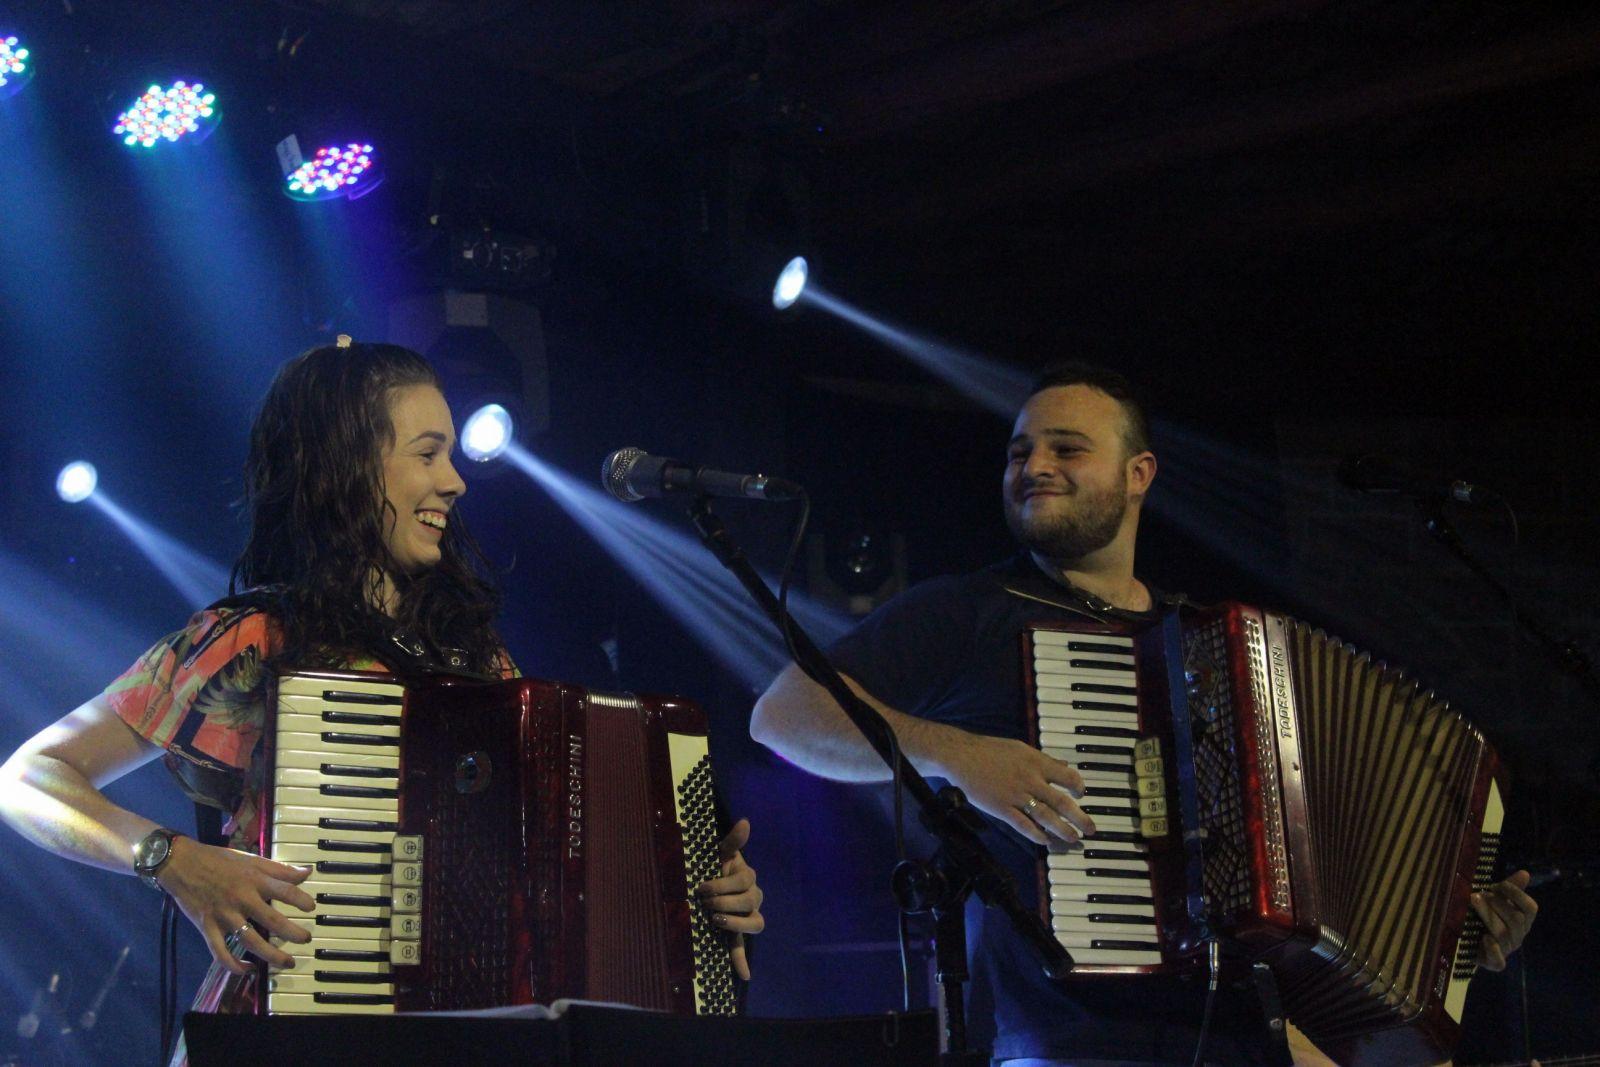 Ana Paula e Hiago mostraram o talento na sanfona. Foto: Jean Carlos Nesi